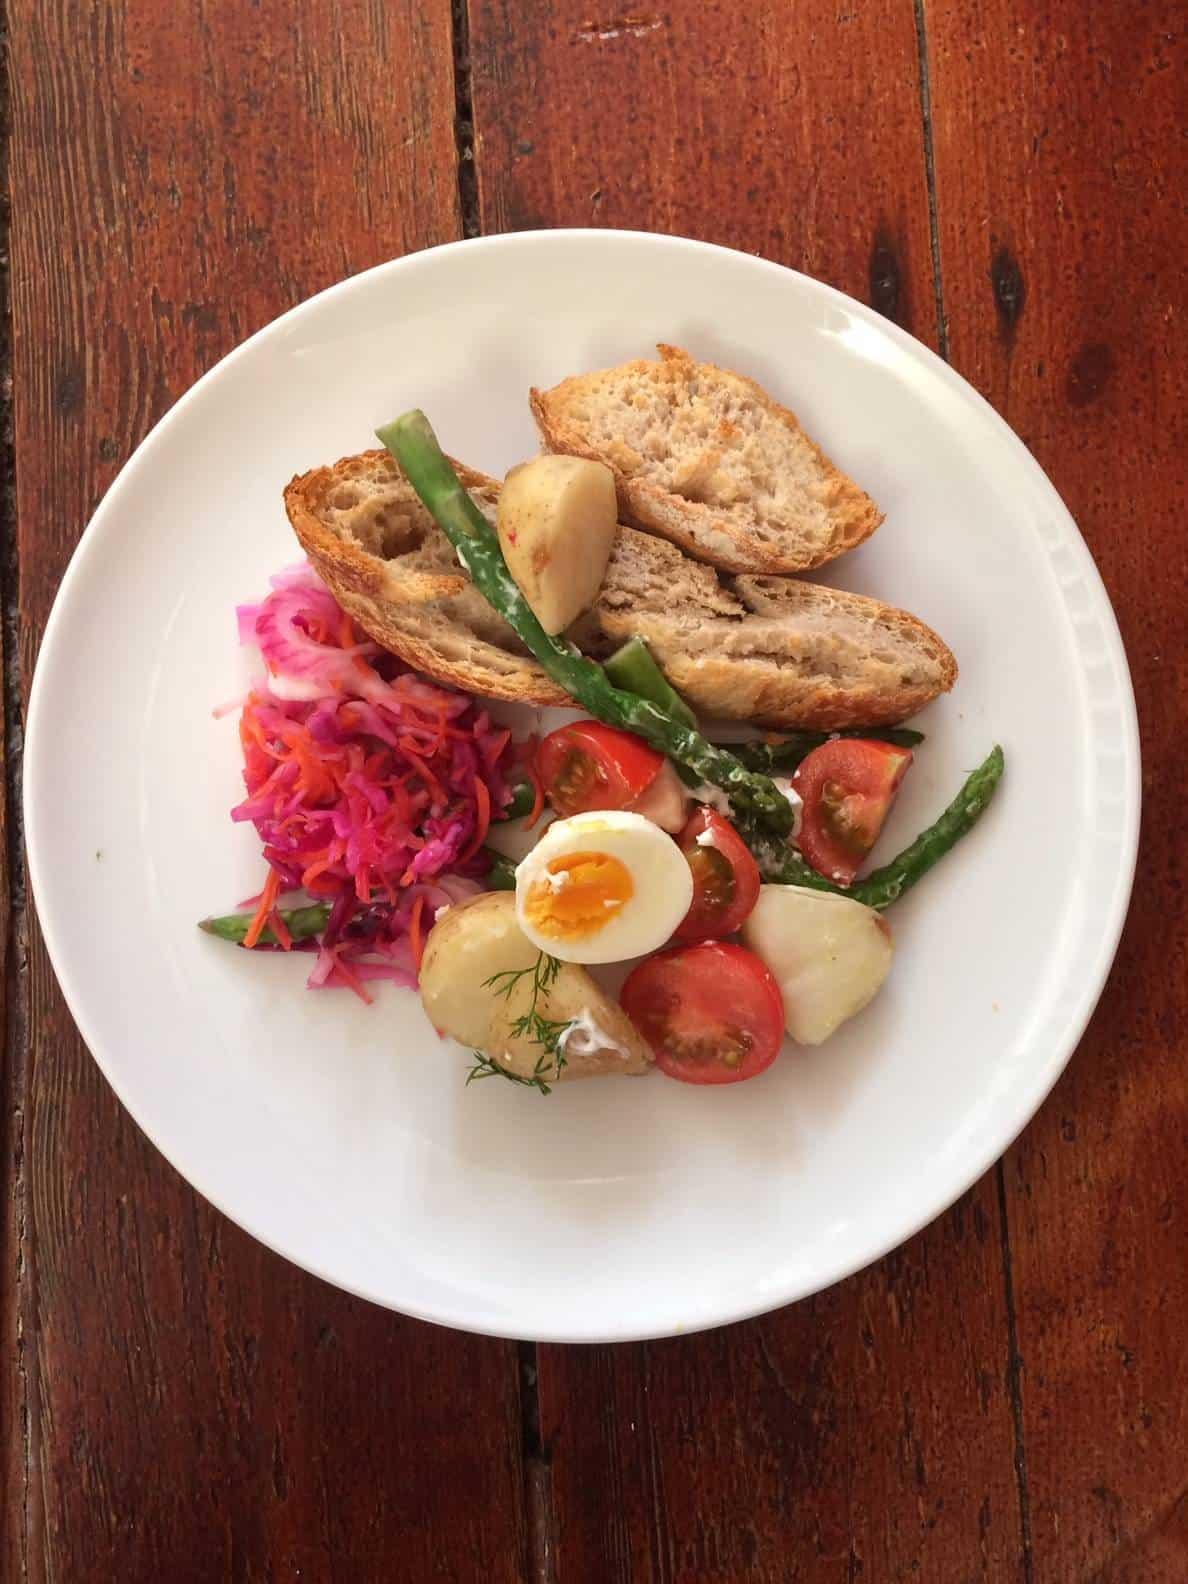 Warm Cypriot Salad